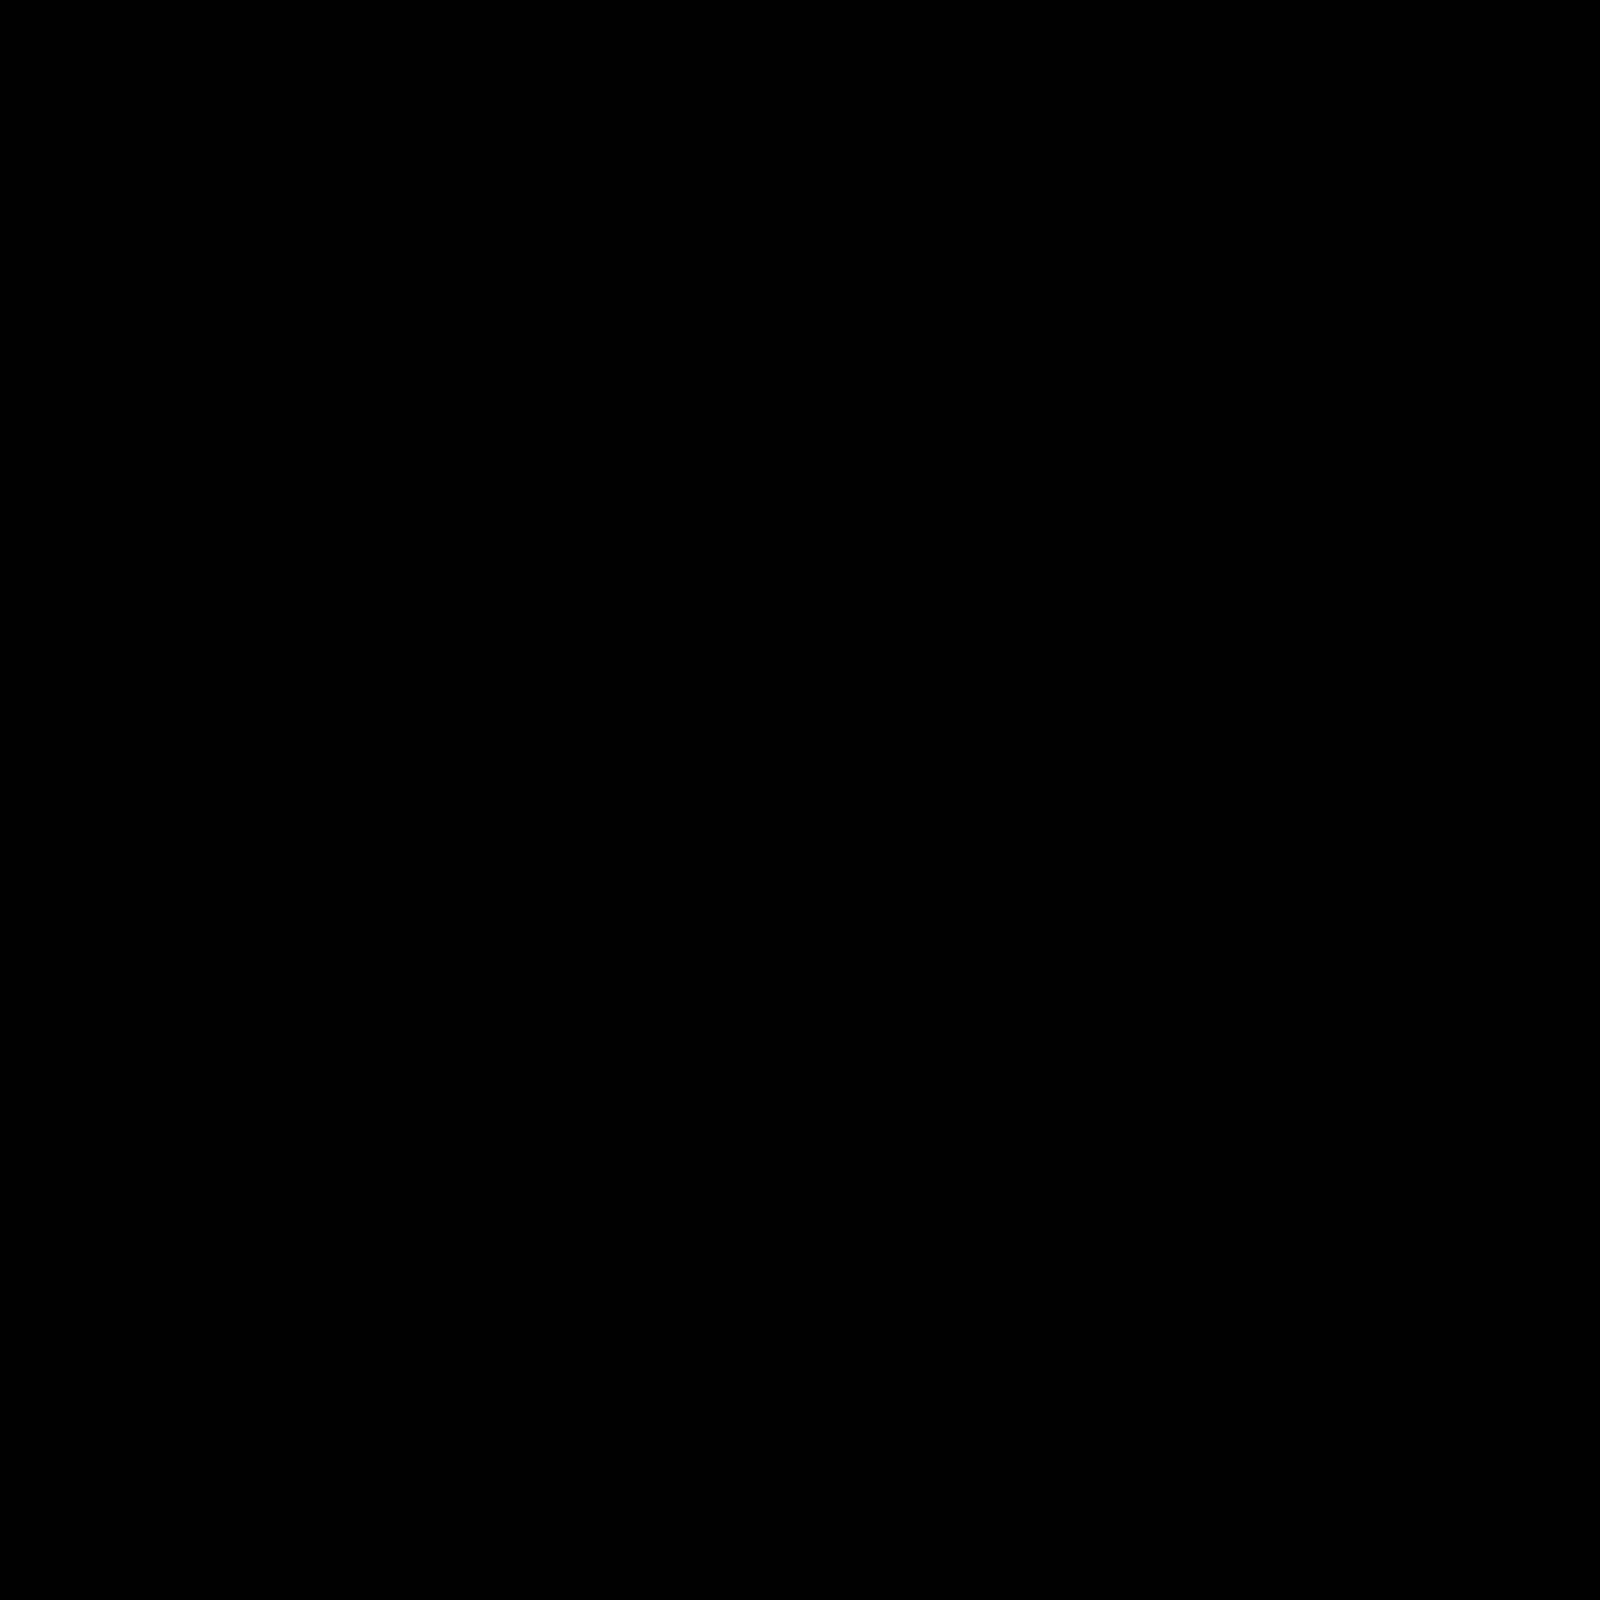 Kieliszek wódki icon